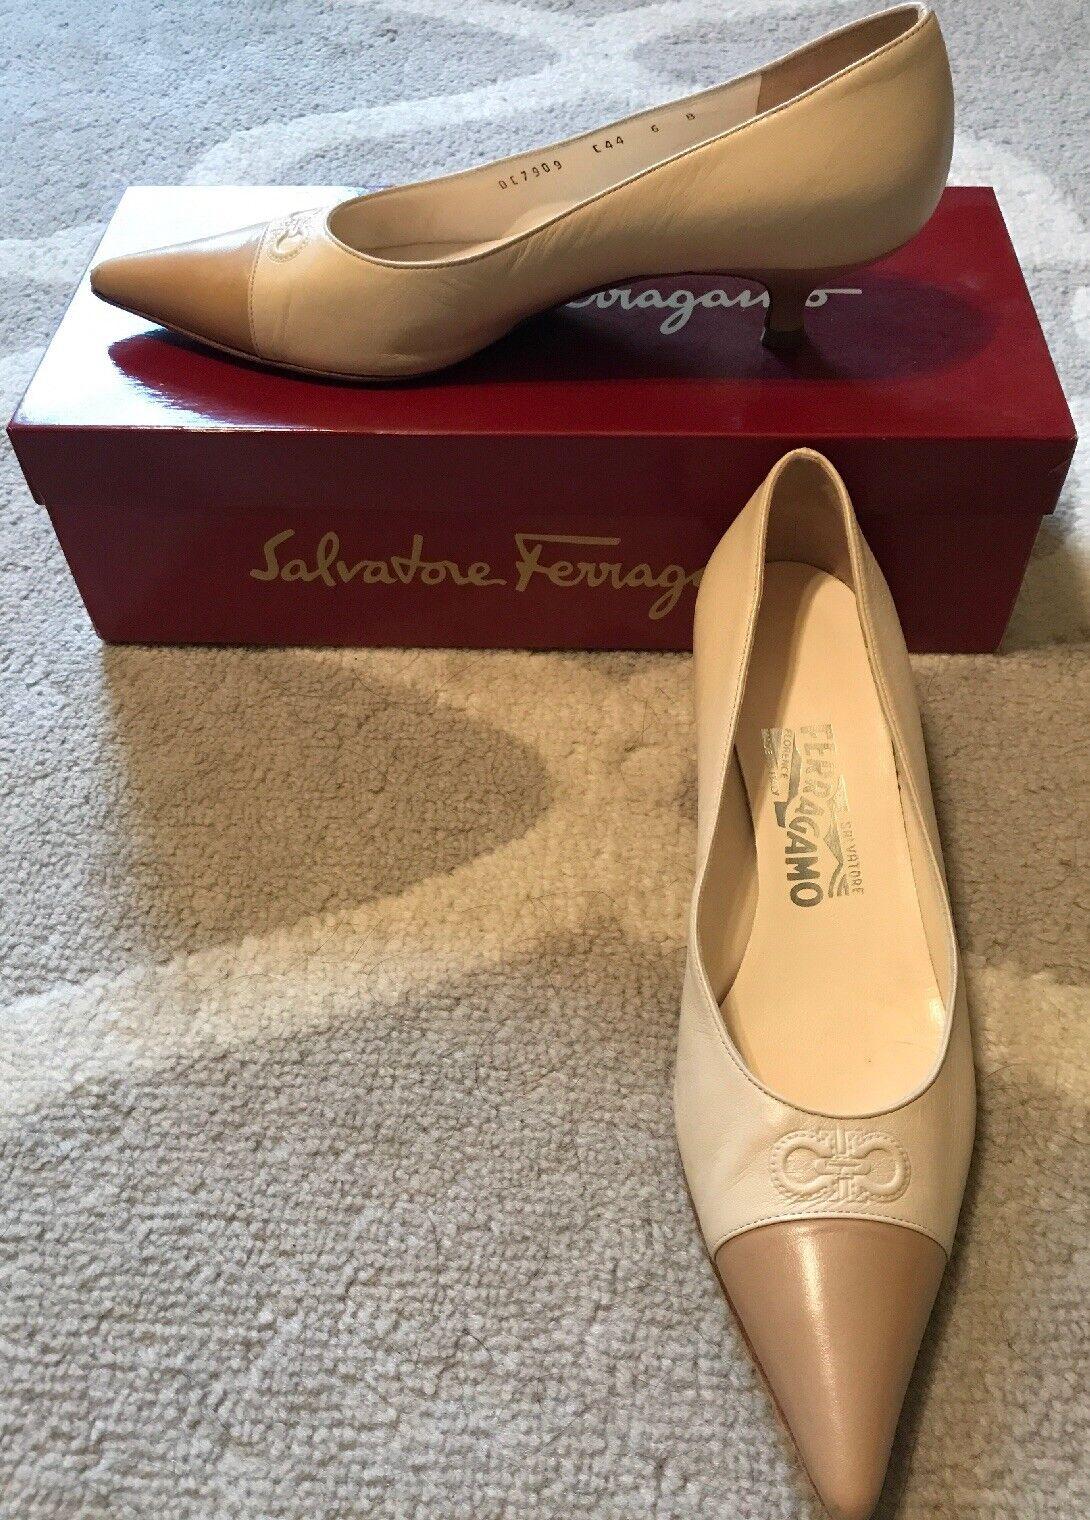 SALVATORE FERRAGAMO VINTAGE VINTAGE VINTAGE PUMPS heels BEIGE TAN 6 B  CARRER  4cm 4c99bb